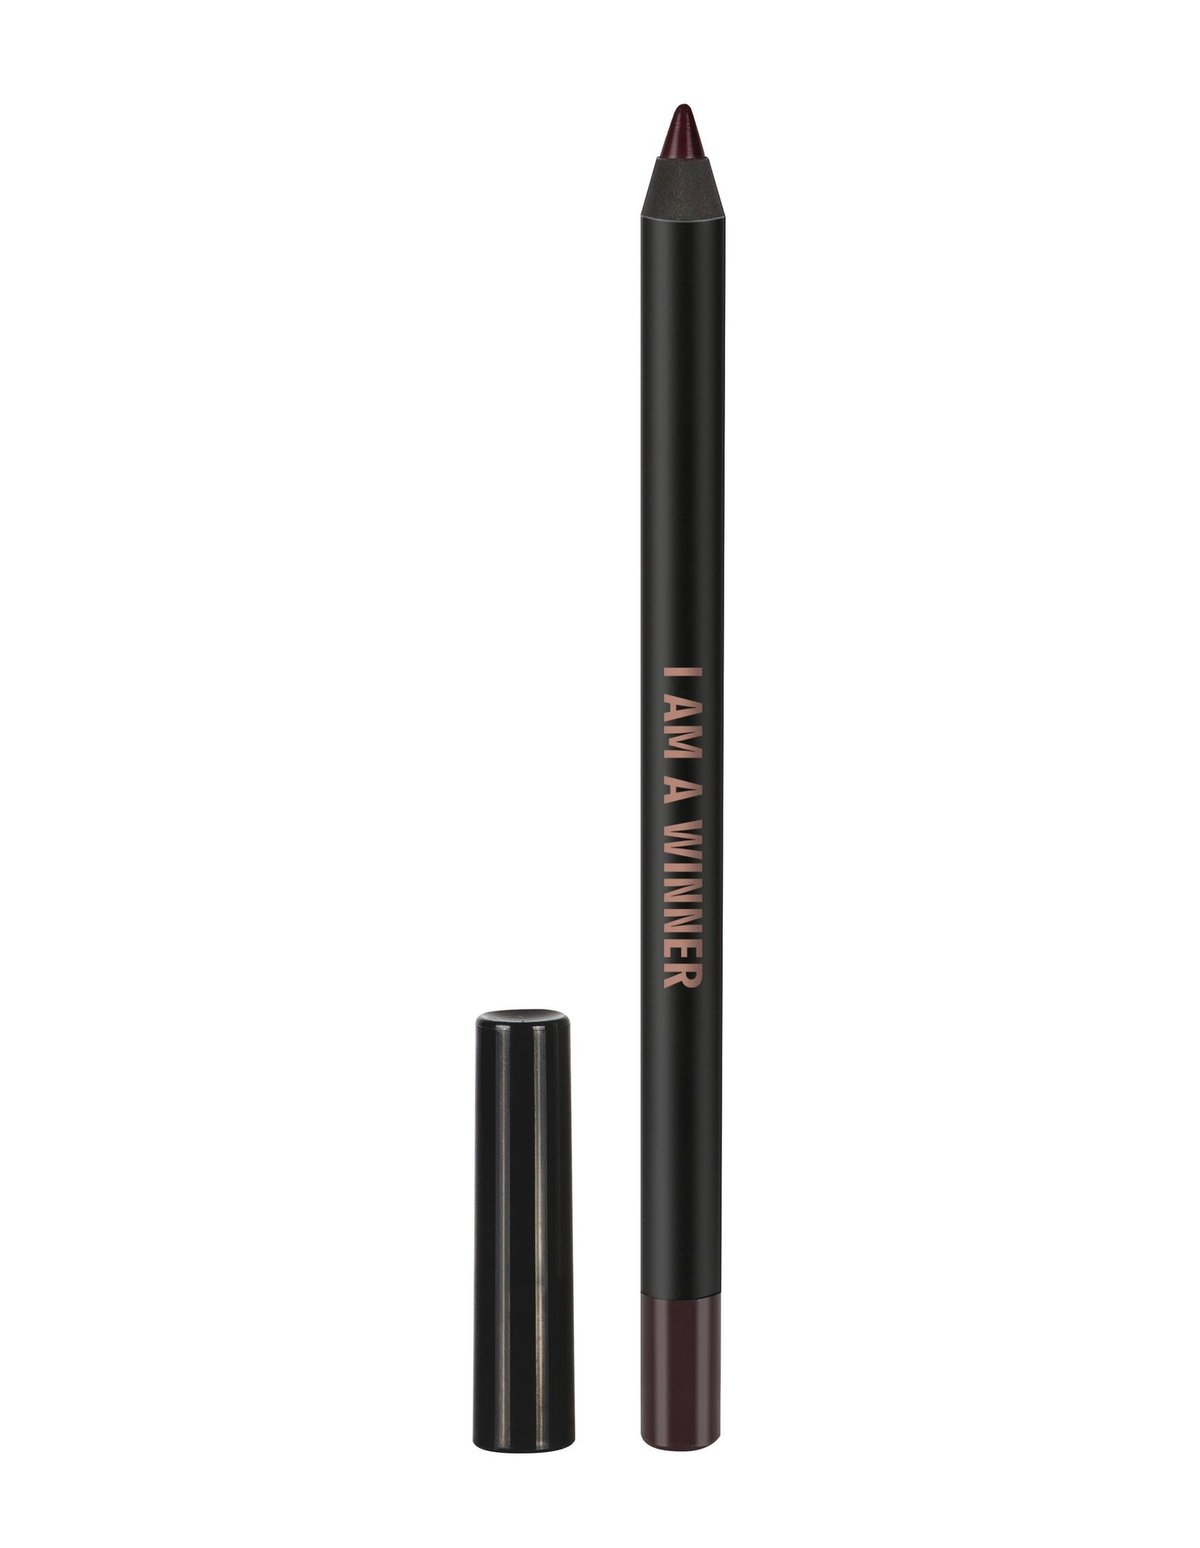 商品REALHER 多彩塑形唇线笔 I AM A WINNER lip liner图片